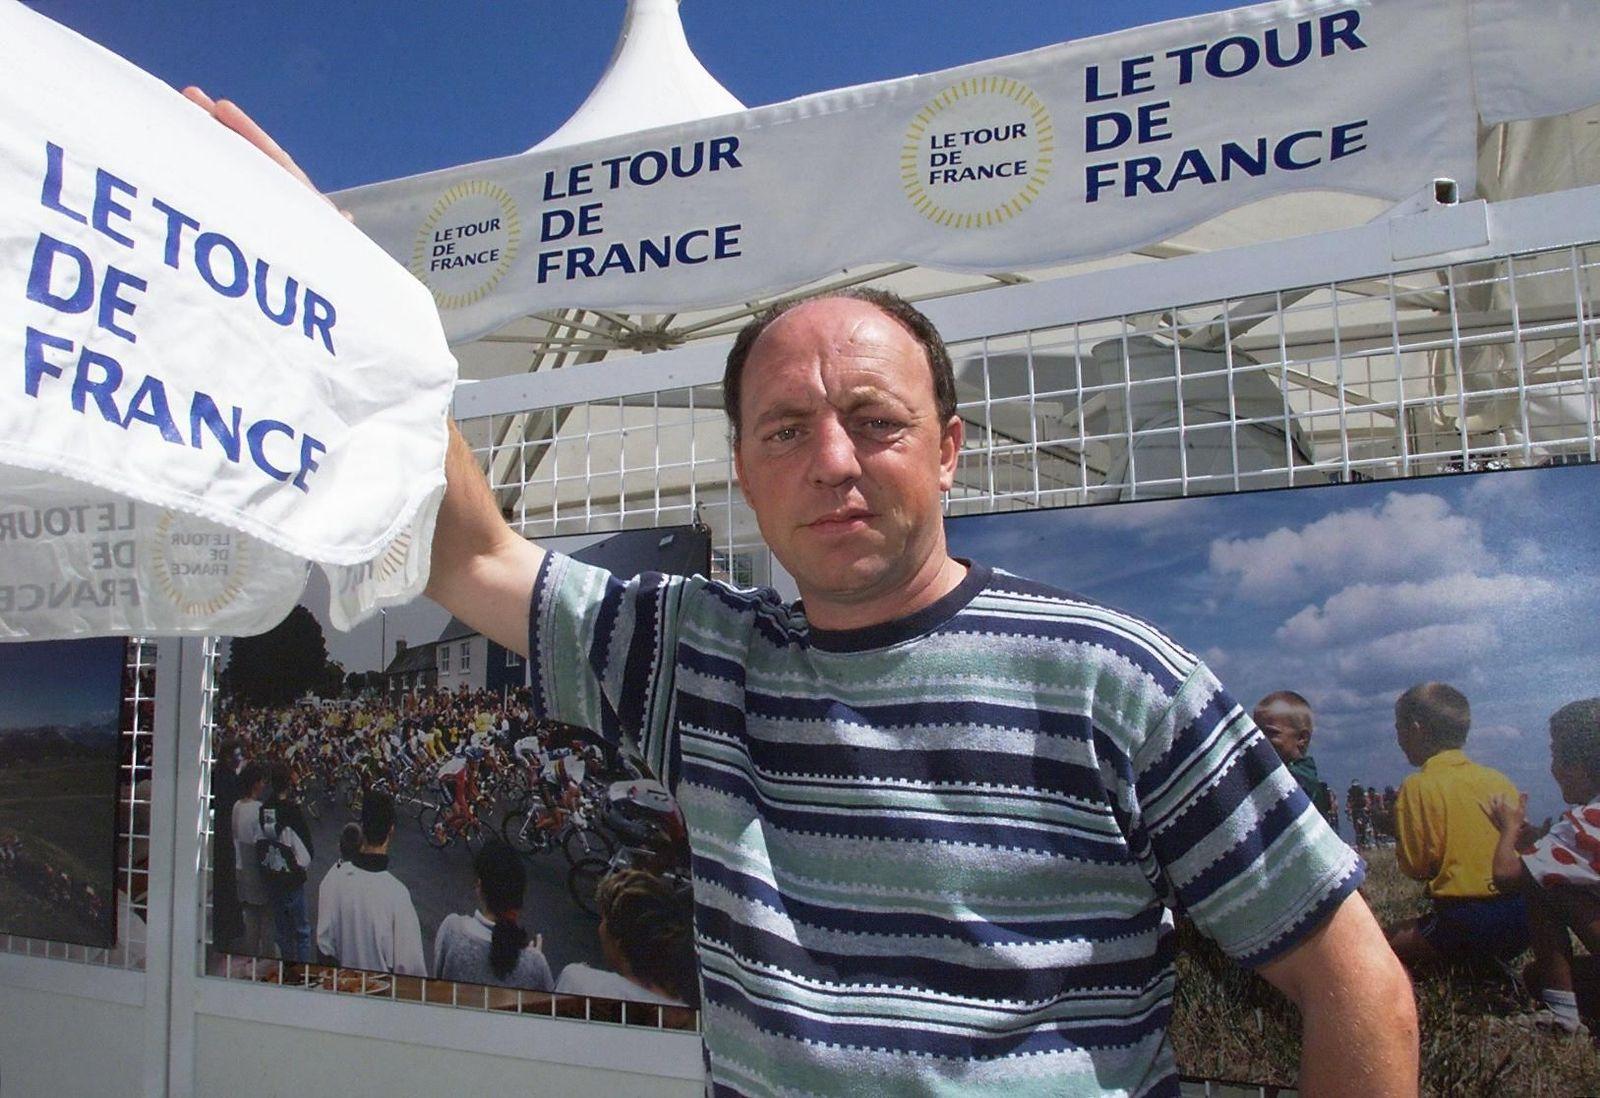 Antoine Vayer